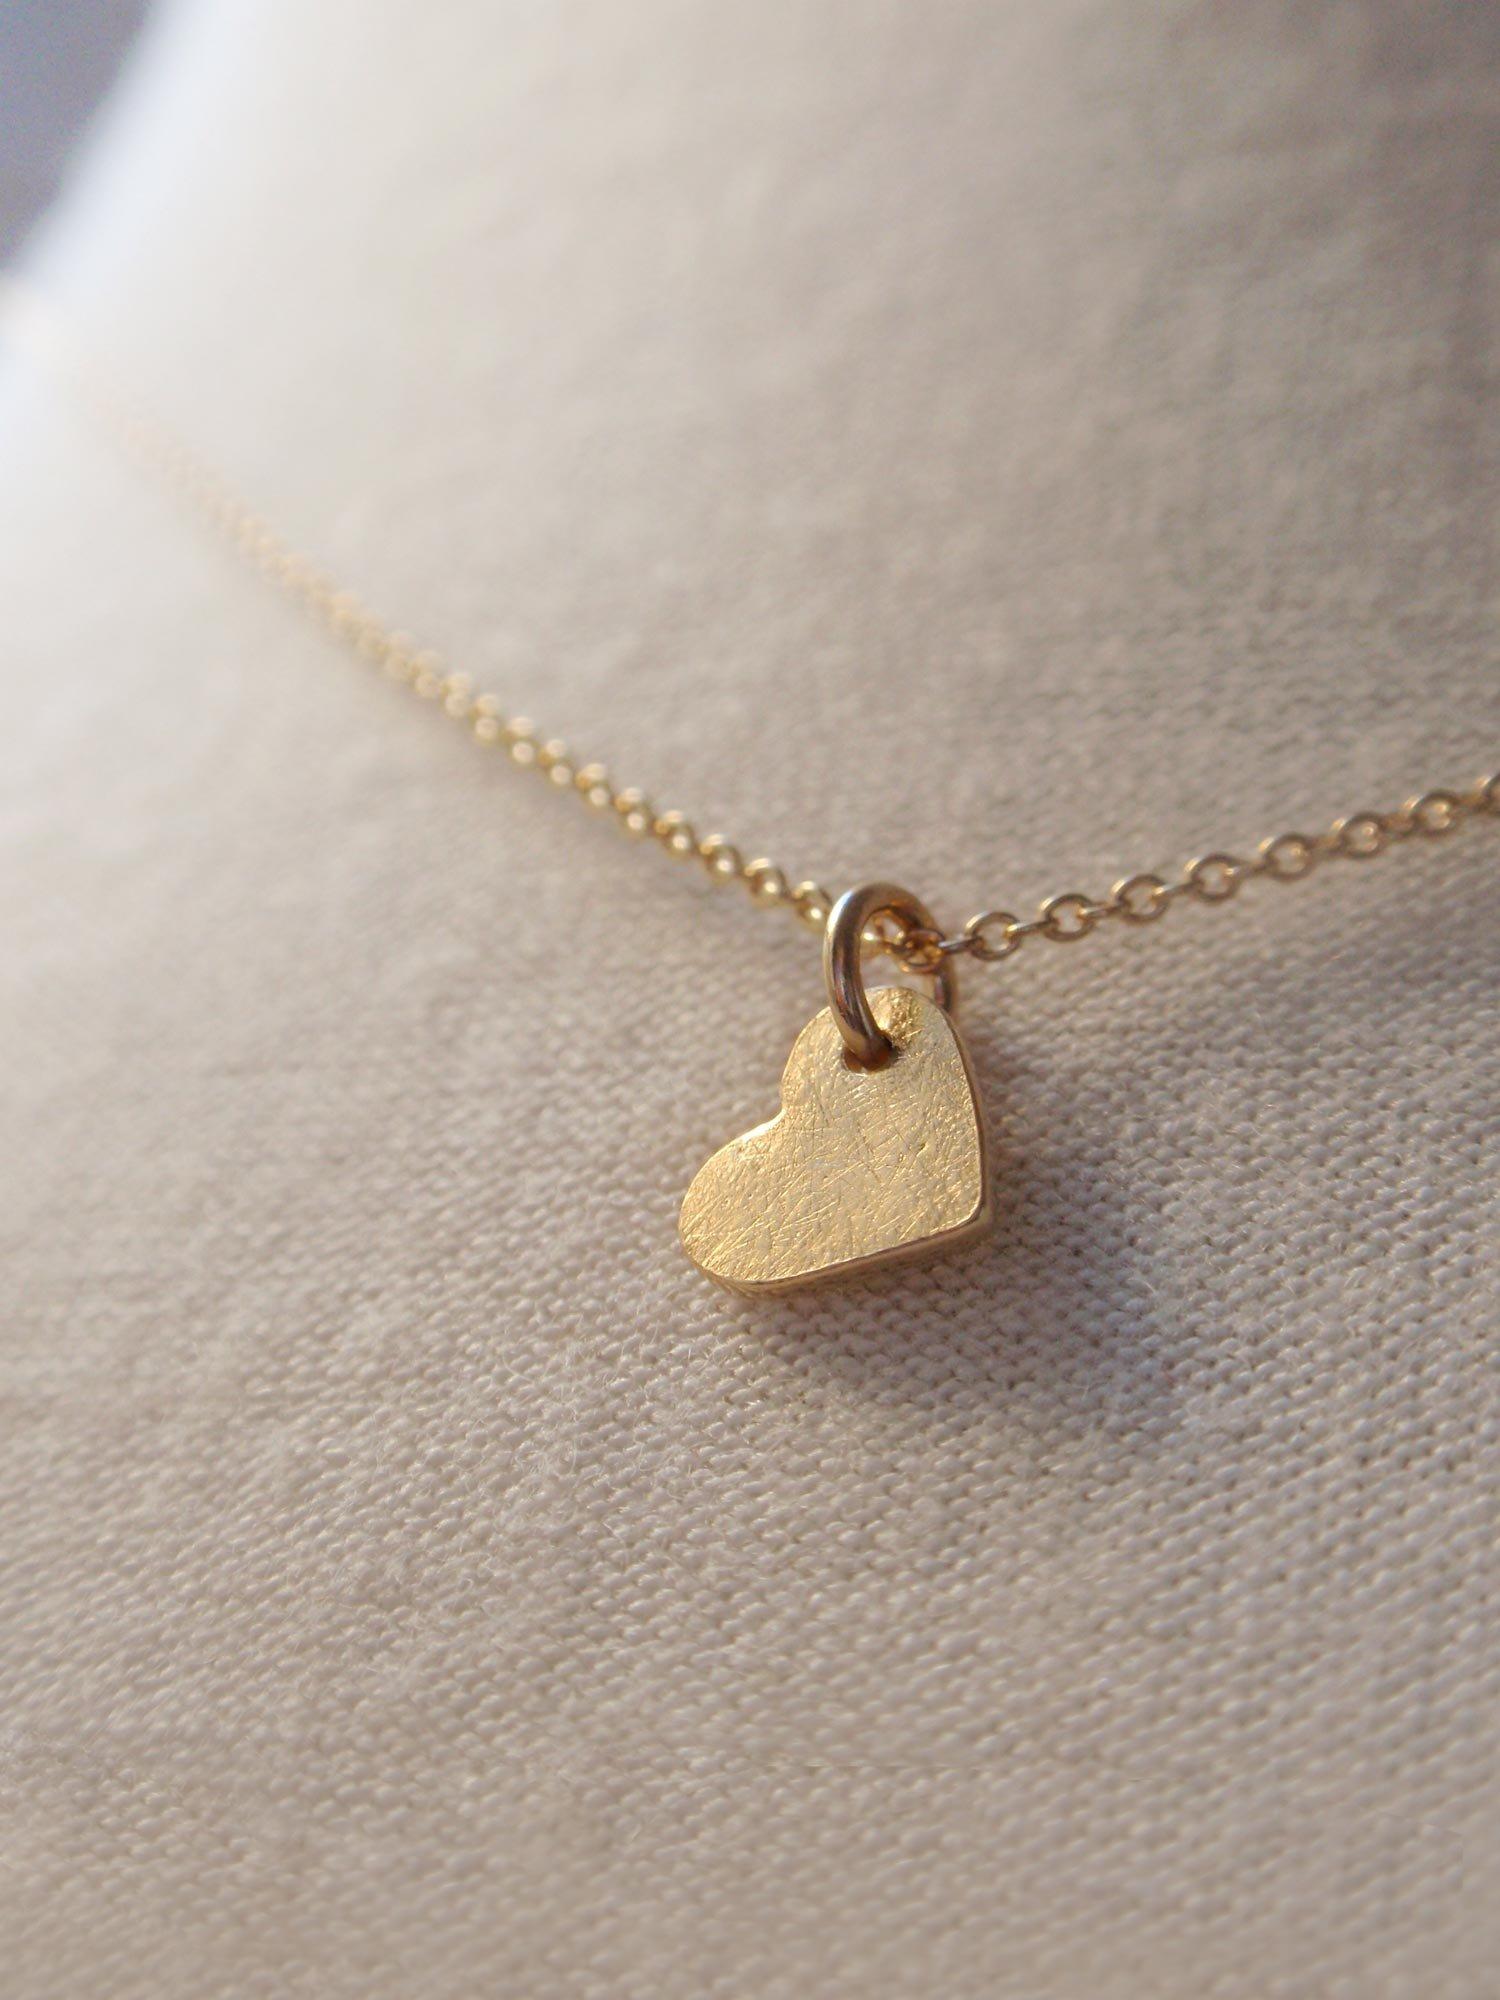 Image of Little Heart Necklace - Golden